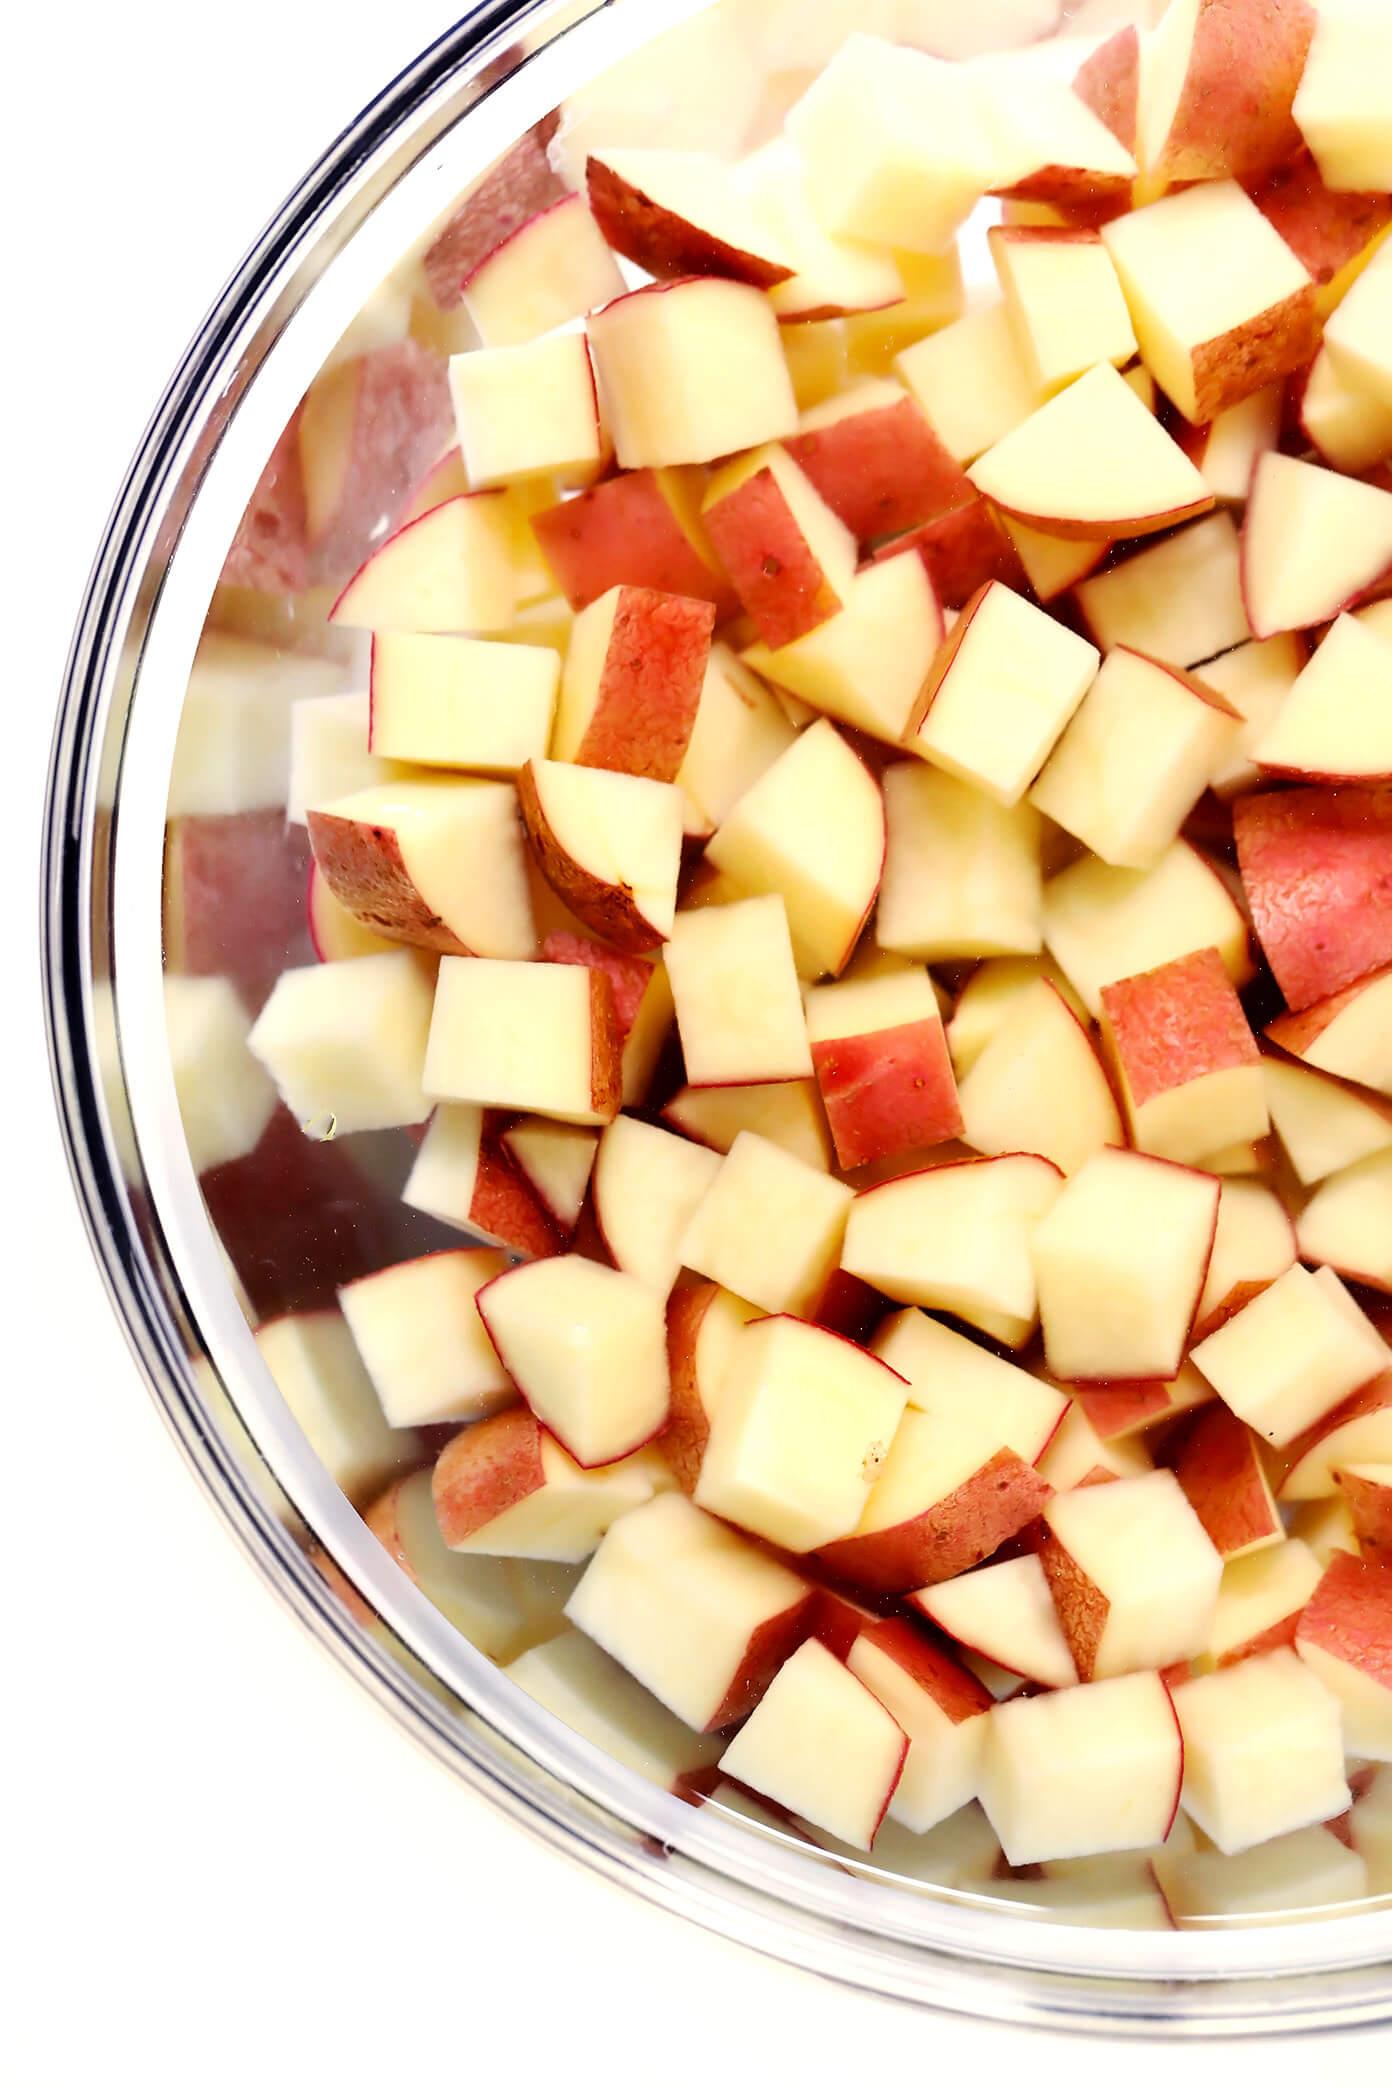 Diced Potatoes | Extra Crispy Roasted Potatoes Recipe